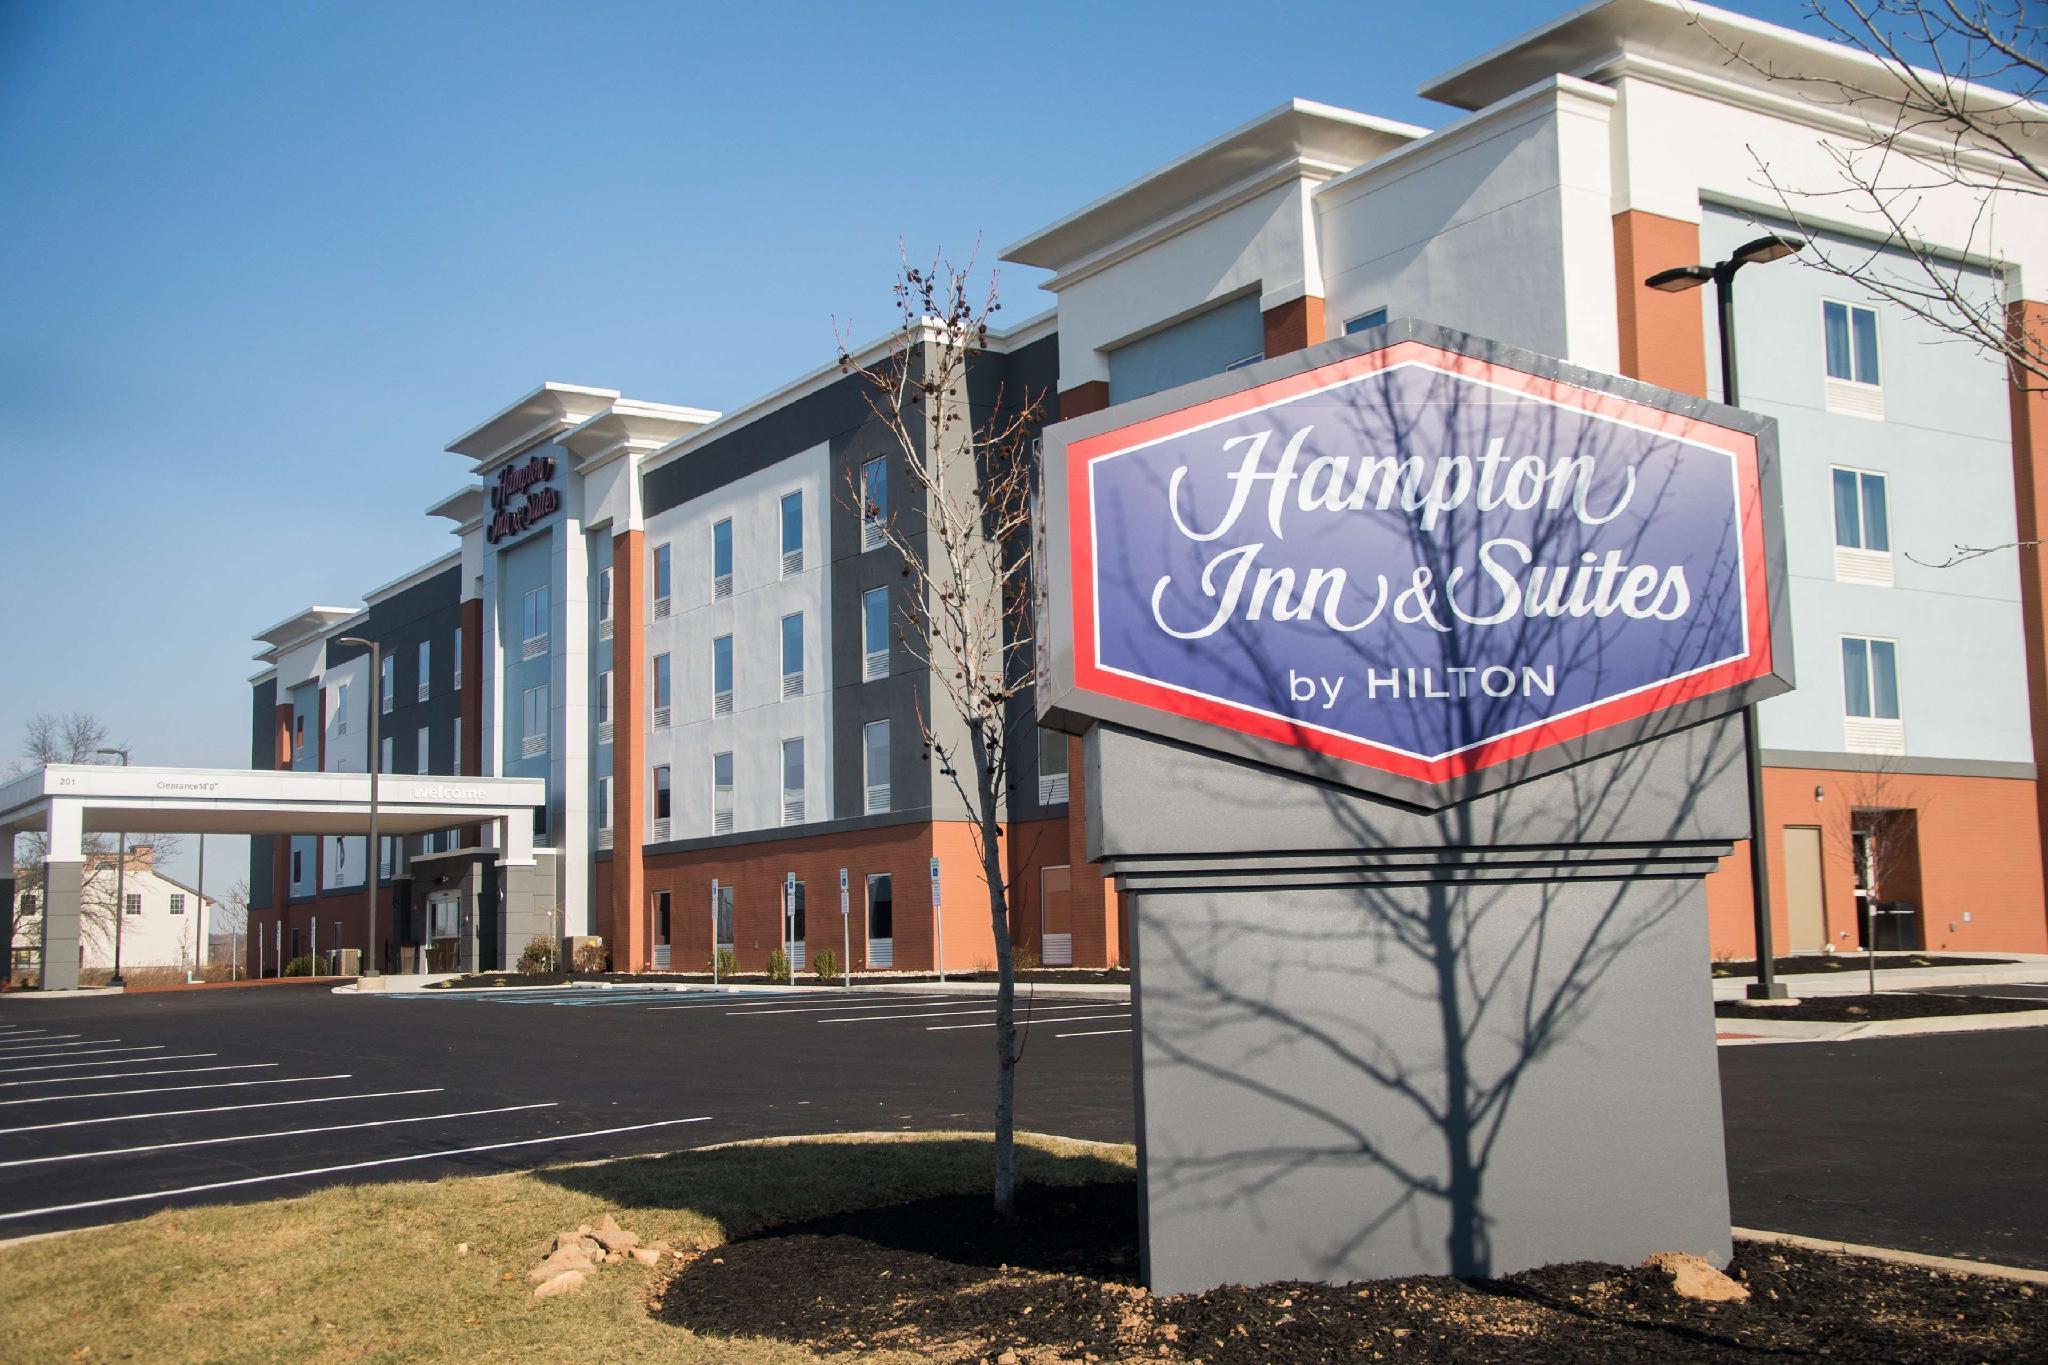 Hampton Inn And Suites By Hilton Warrington Horsham